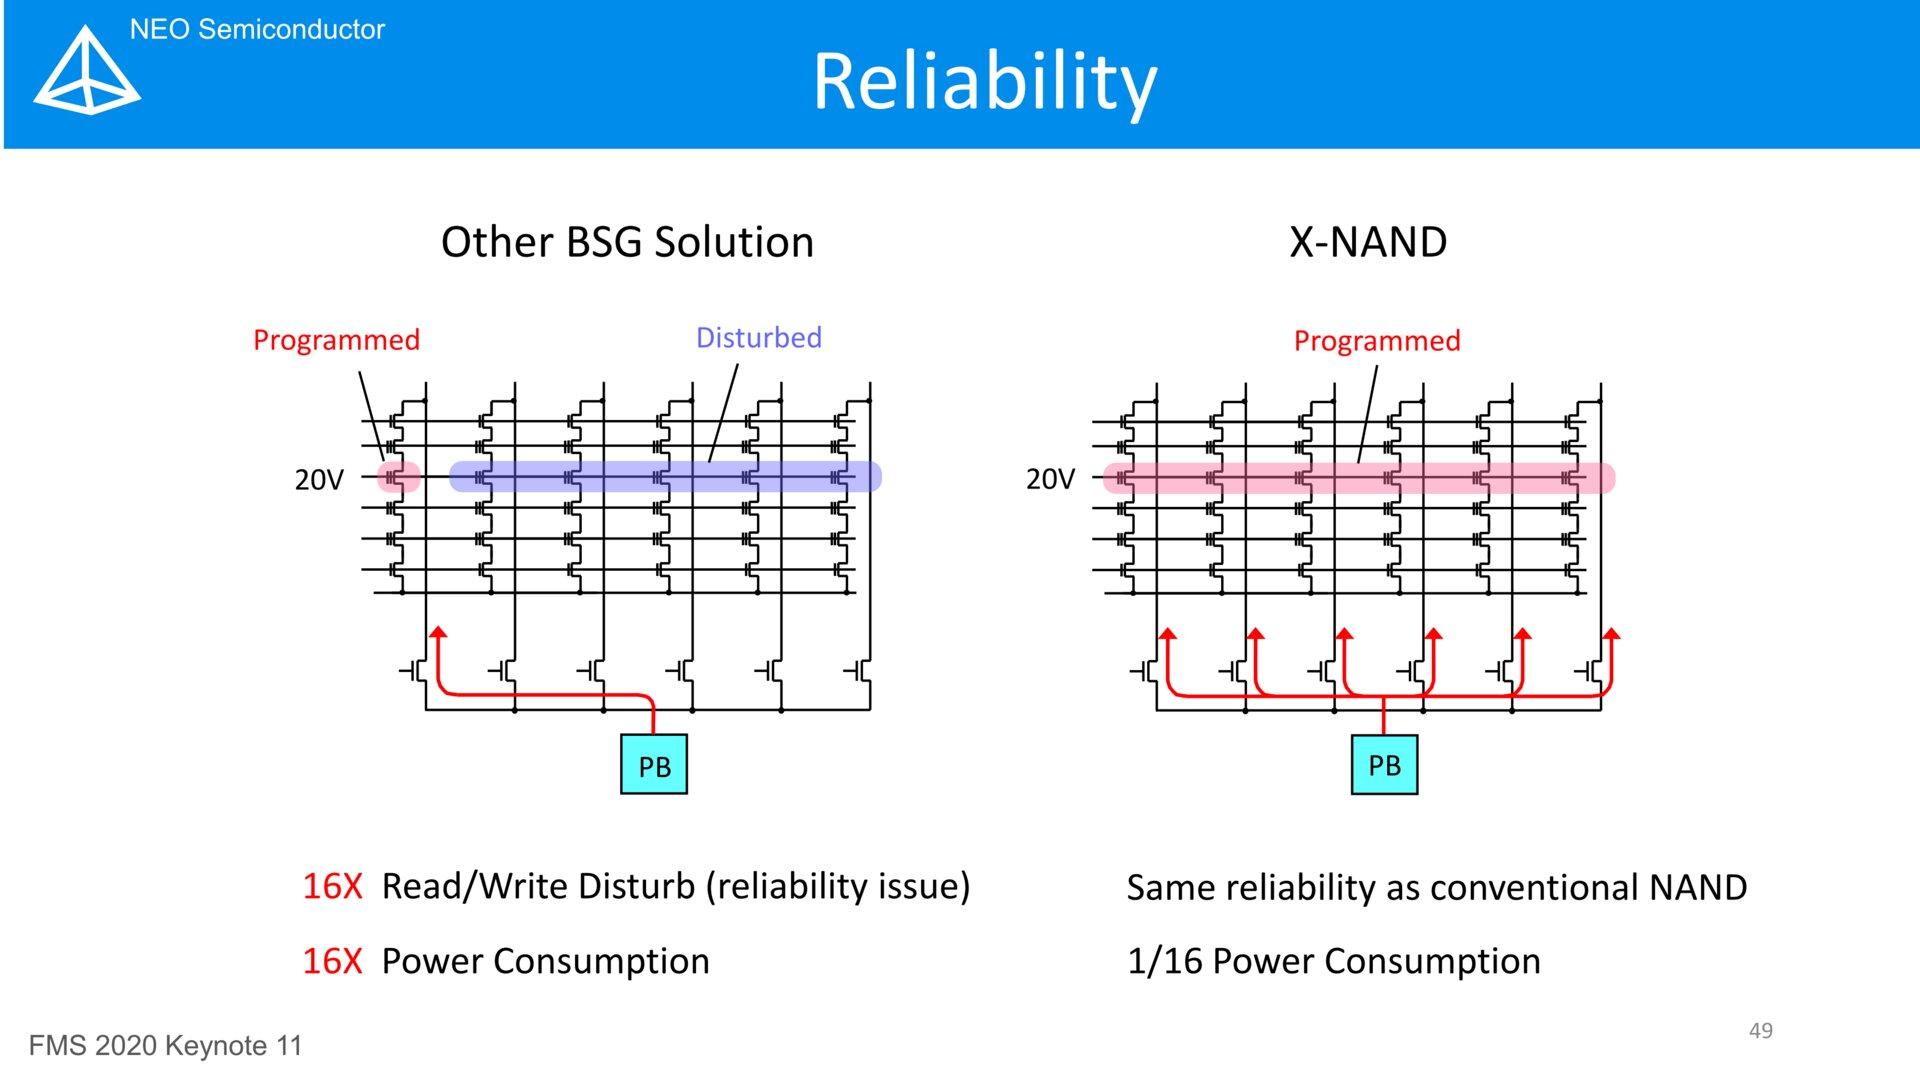 X-NAND Reliability